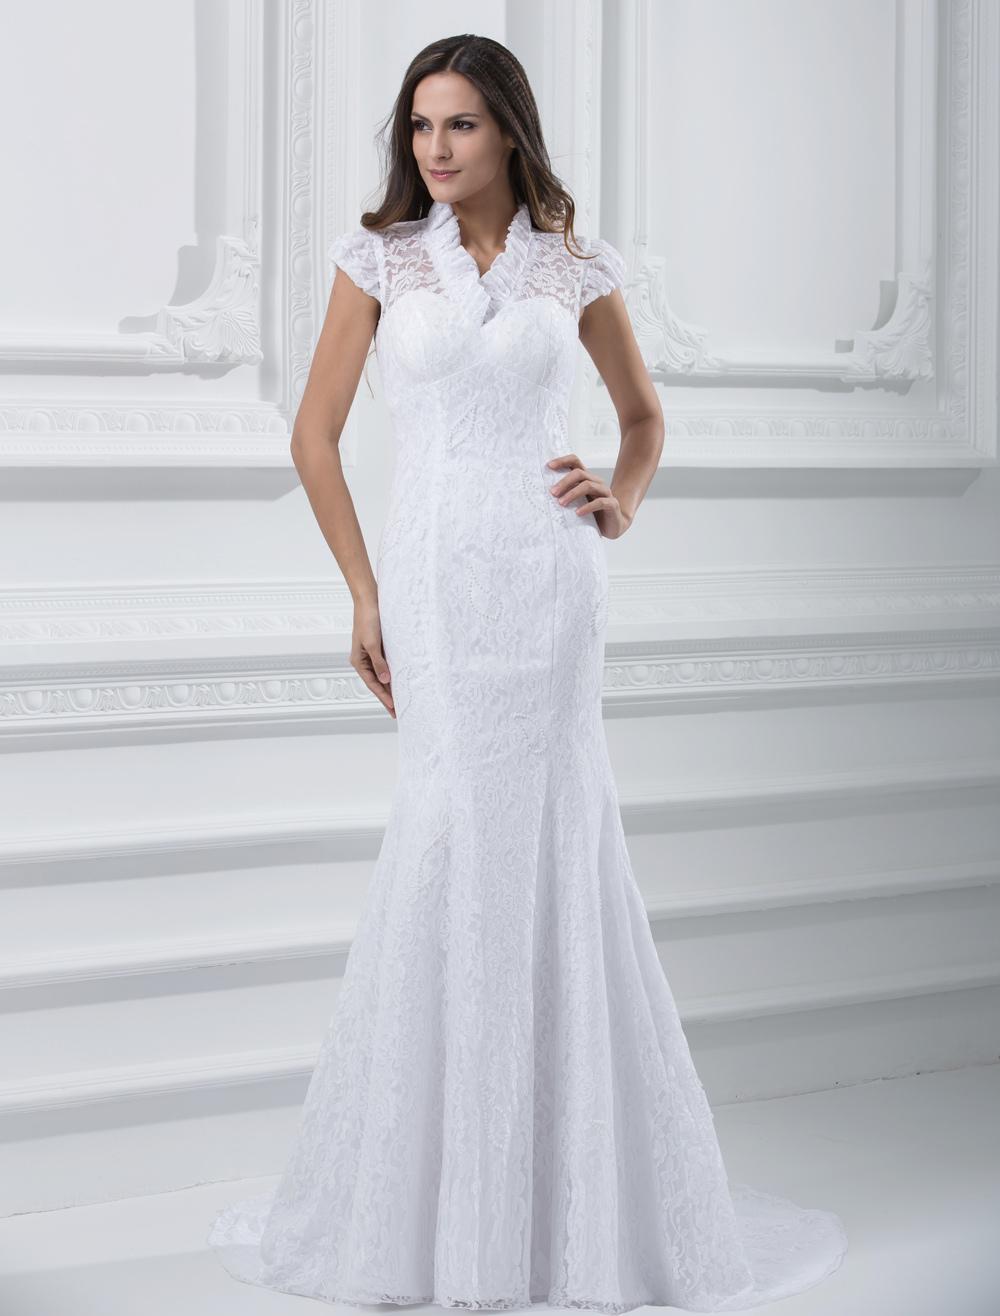 Glamorous White Lace Mermaid Wedding Dress For Bride (Cheap Wedding Dress) photo